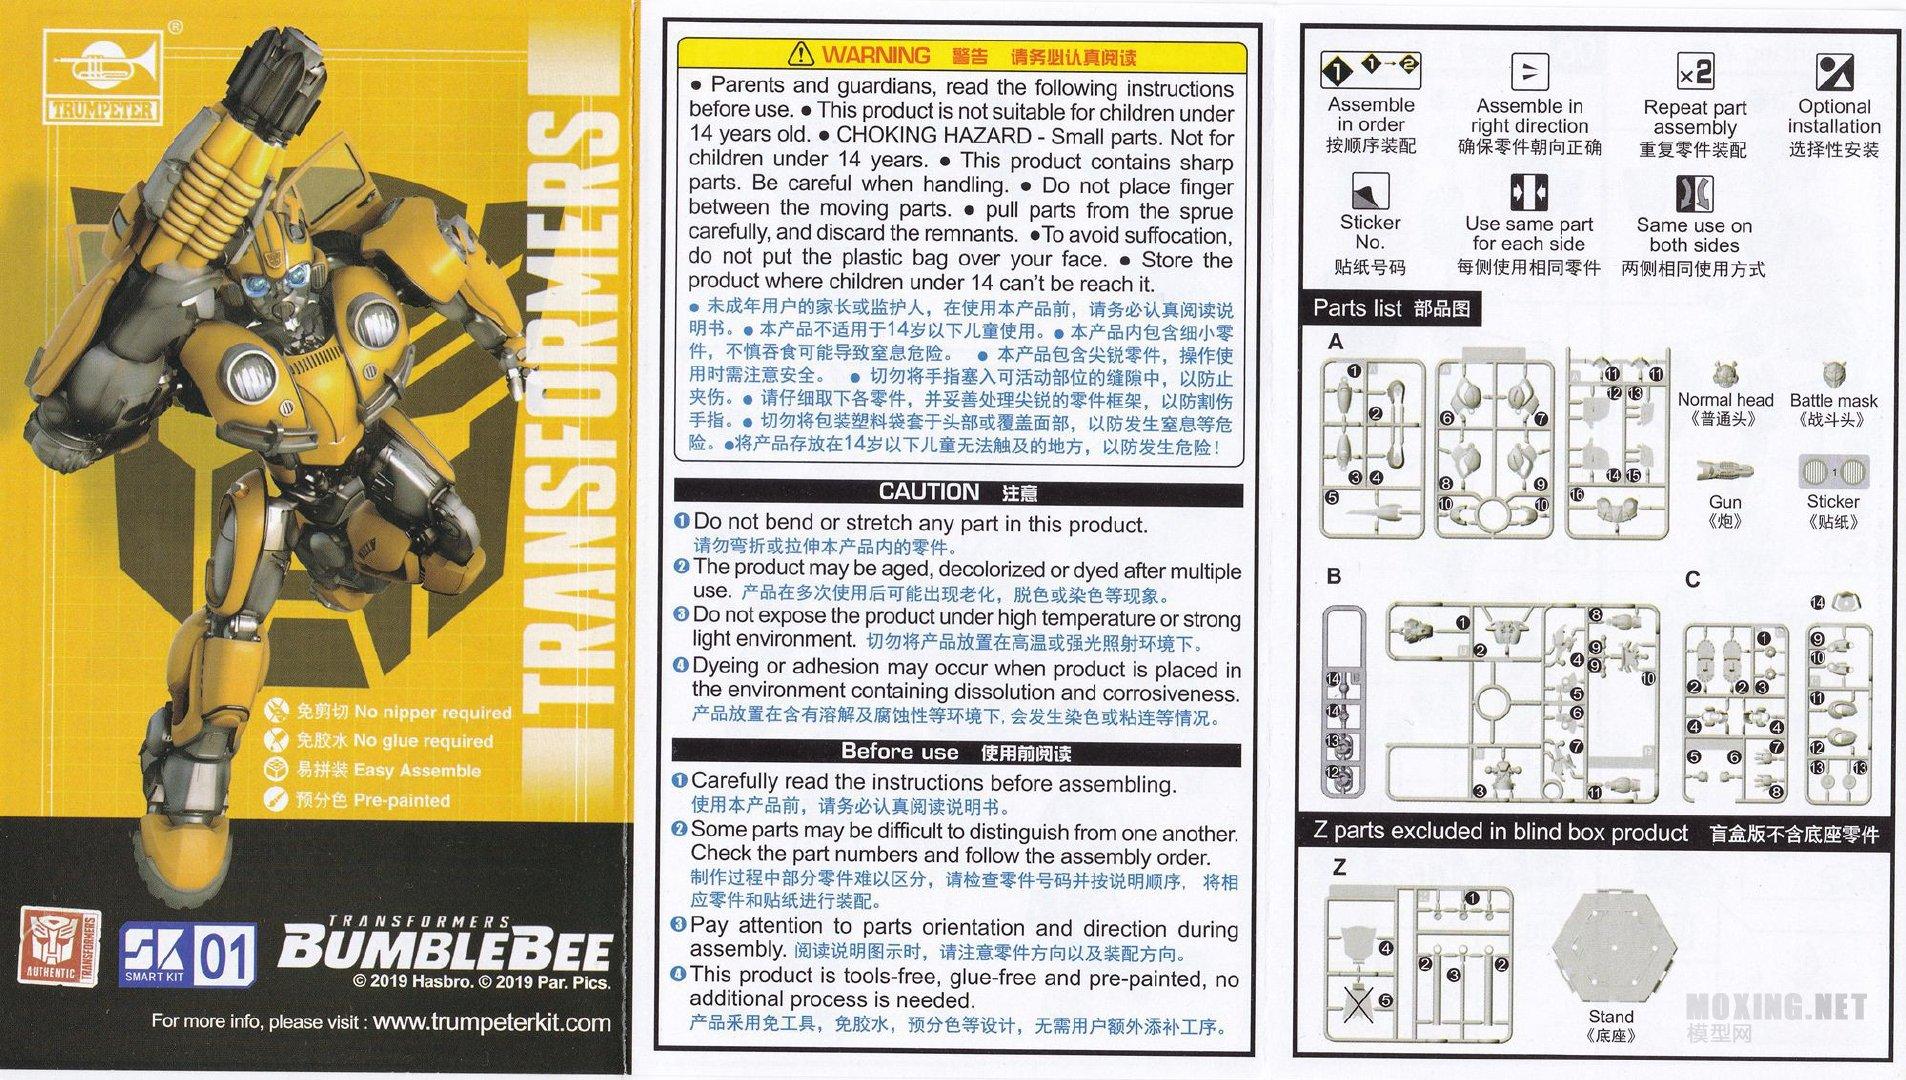 S519_TRUMPETER_BUMBLEBEE_review_010.jpg